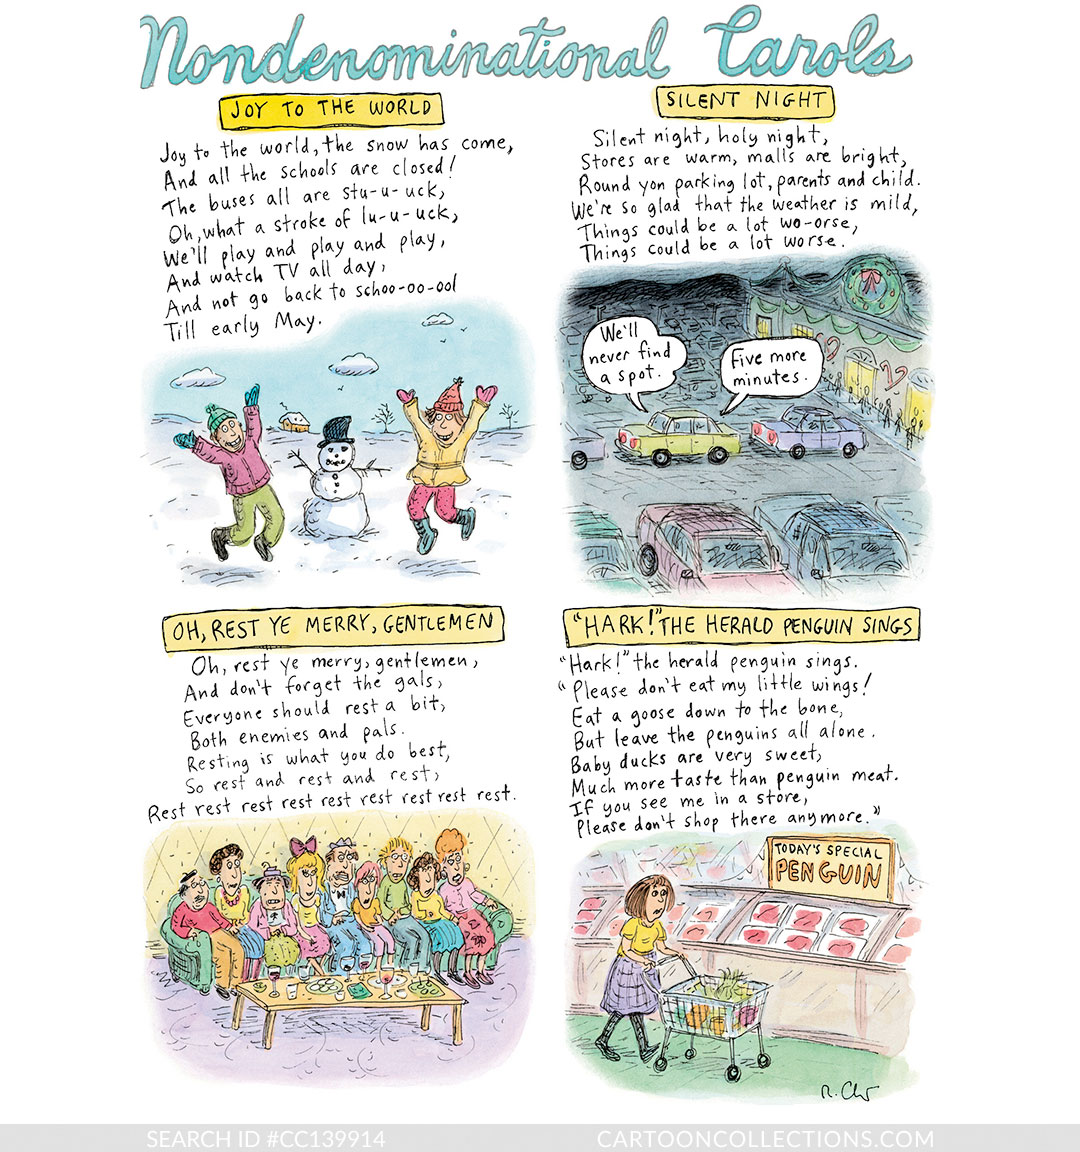 CartoonCollections.com - Christmas cartoons - Roz Chast